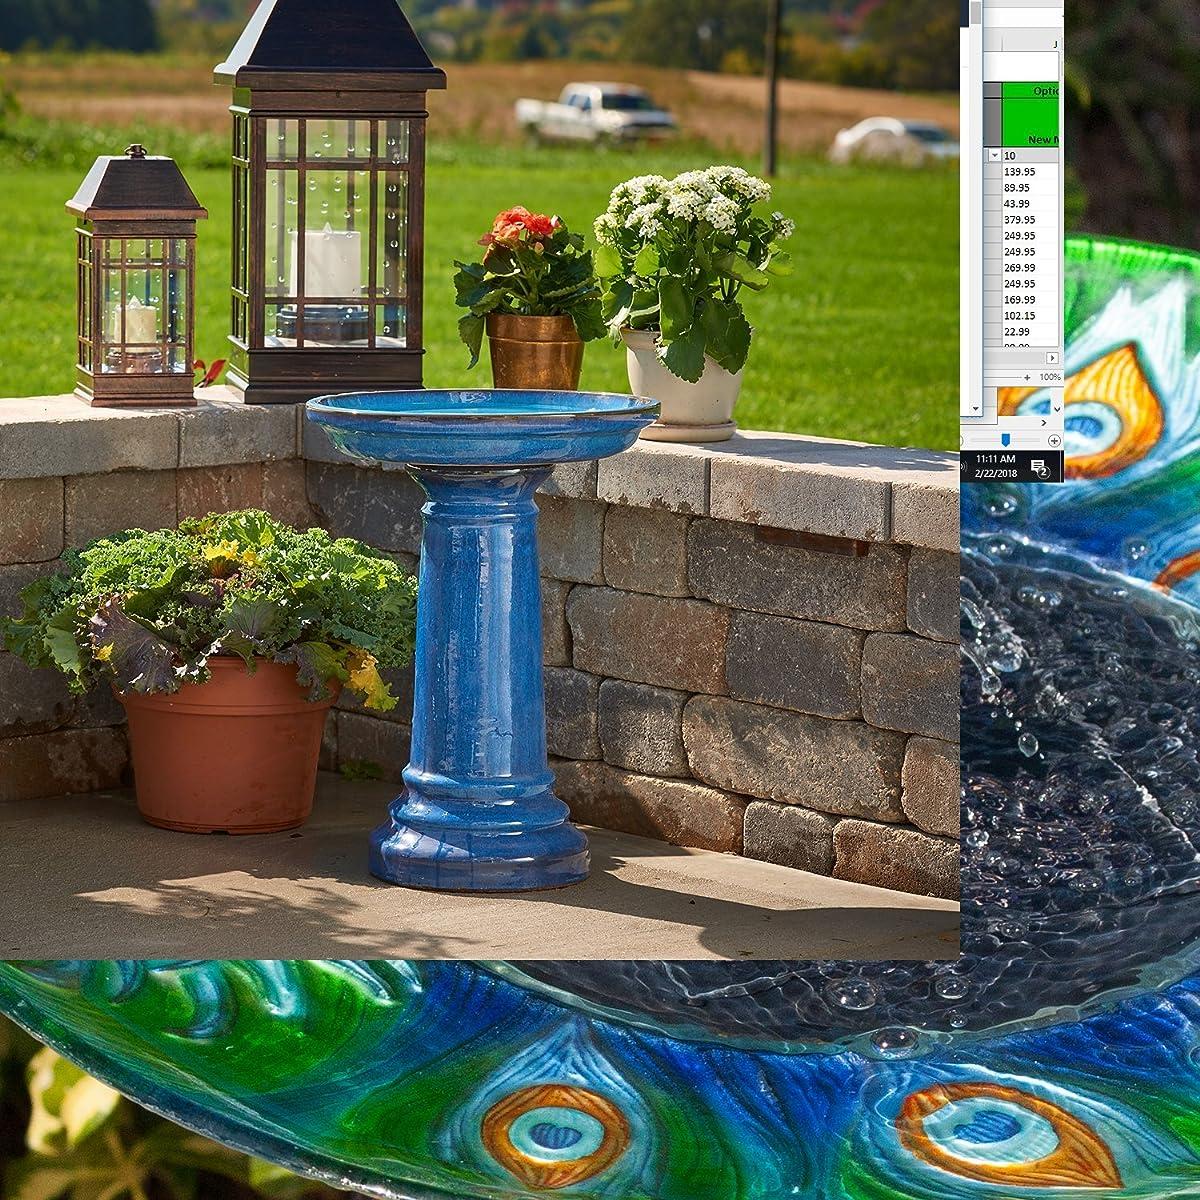 Smart Living207104-BT Aviatra Ceramic Birdbath, Blue, With Easy Assembly And Great Durability